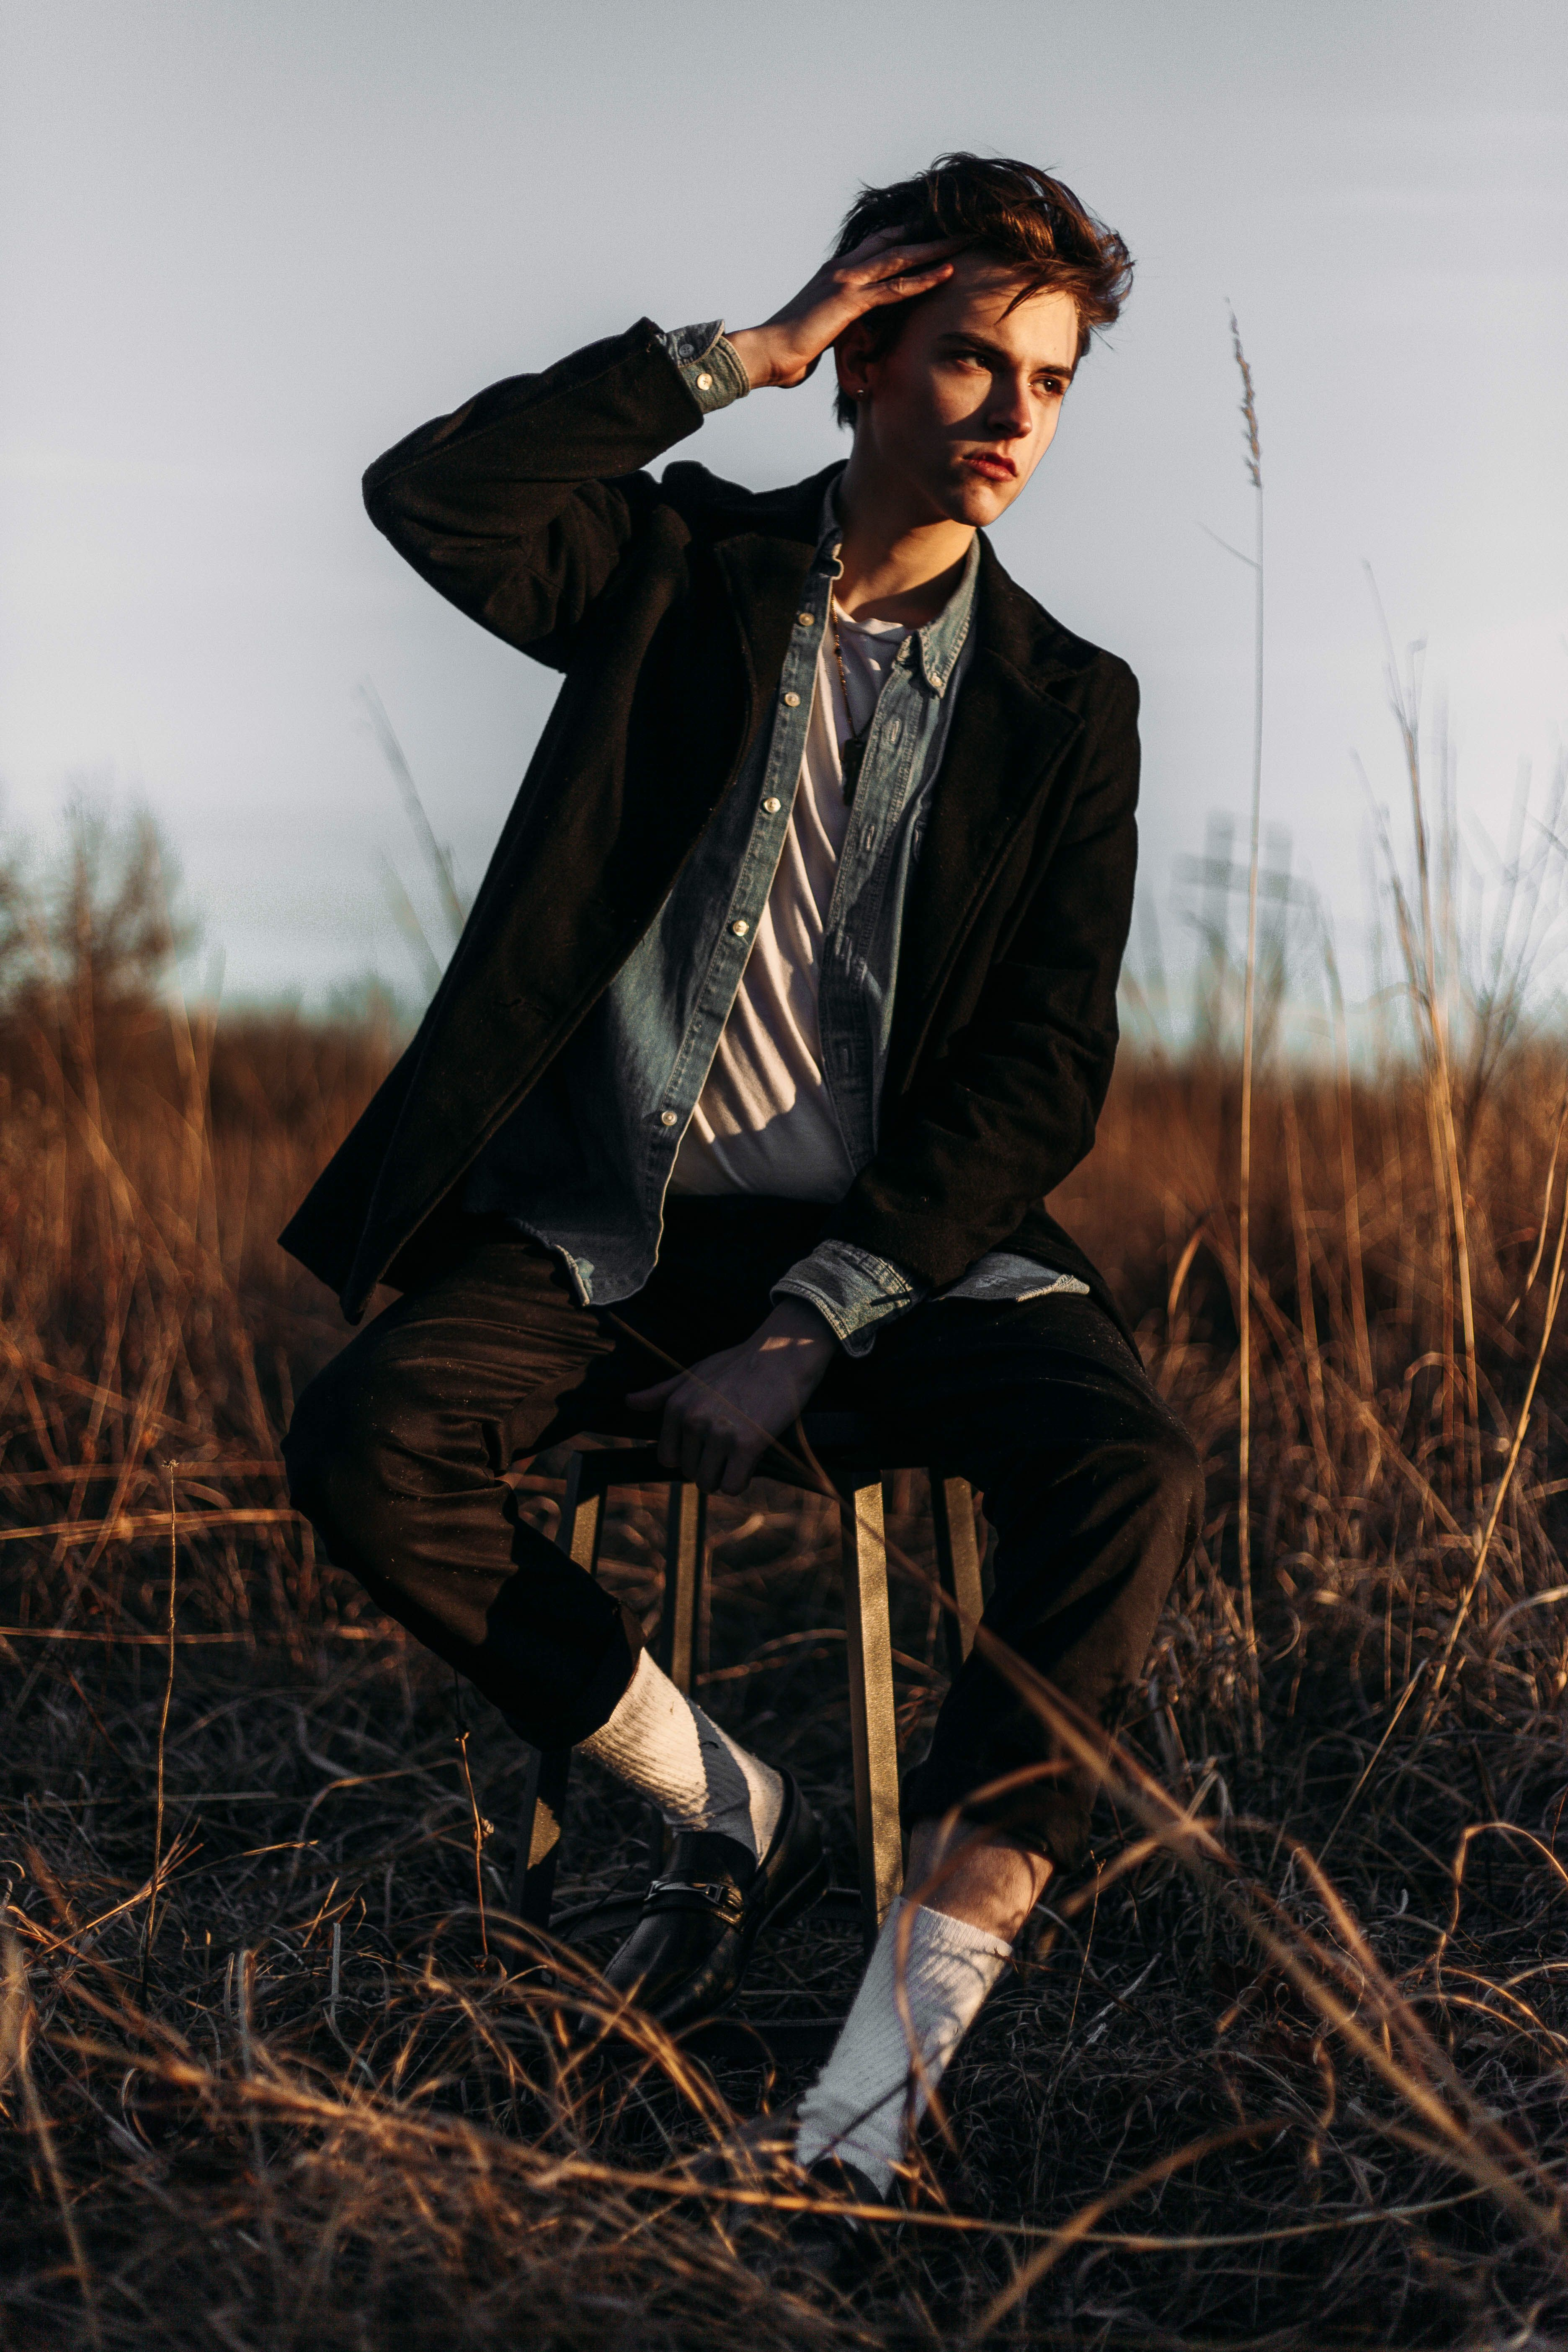 Kassidy Kassidy Jones Instagram Photos And Videos Editorialfashion Kassidy Jone Portrait Photography Men Photography Poses For Men Boy Photography Poses